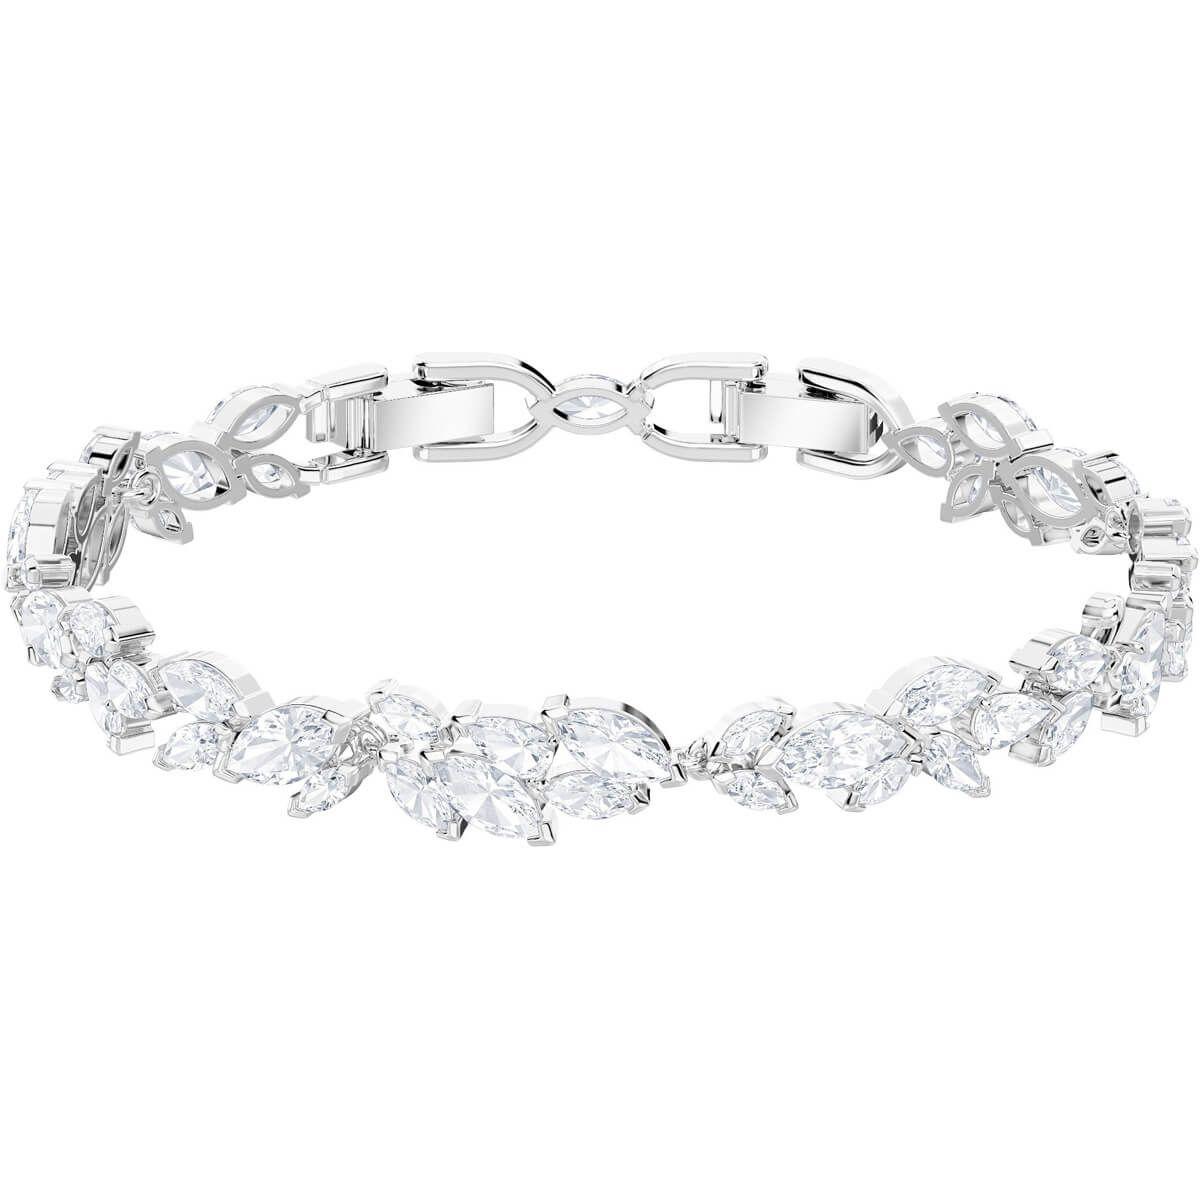 Louison Bracelet White Rhodium Plated Swarovski Bracelet Crystal Necklace Pendant Swarovski Jewelry